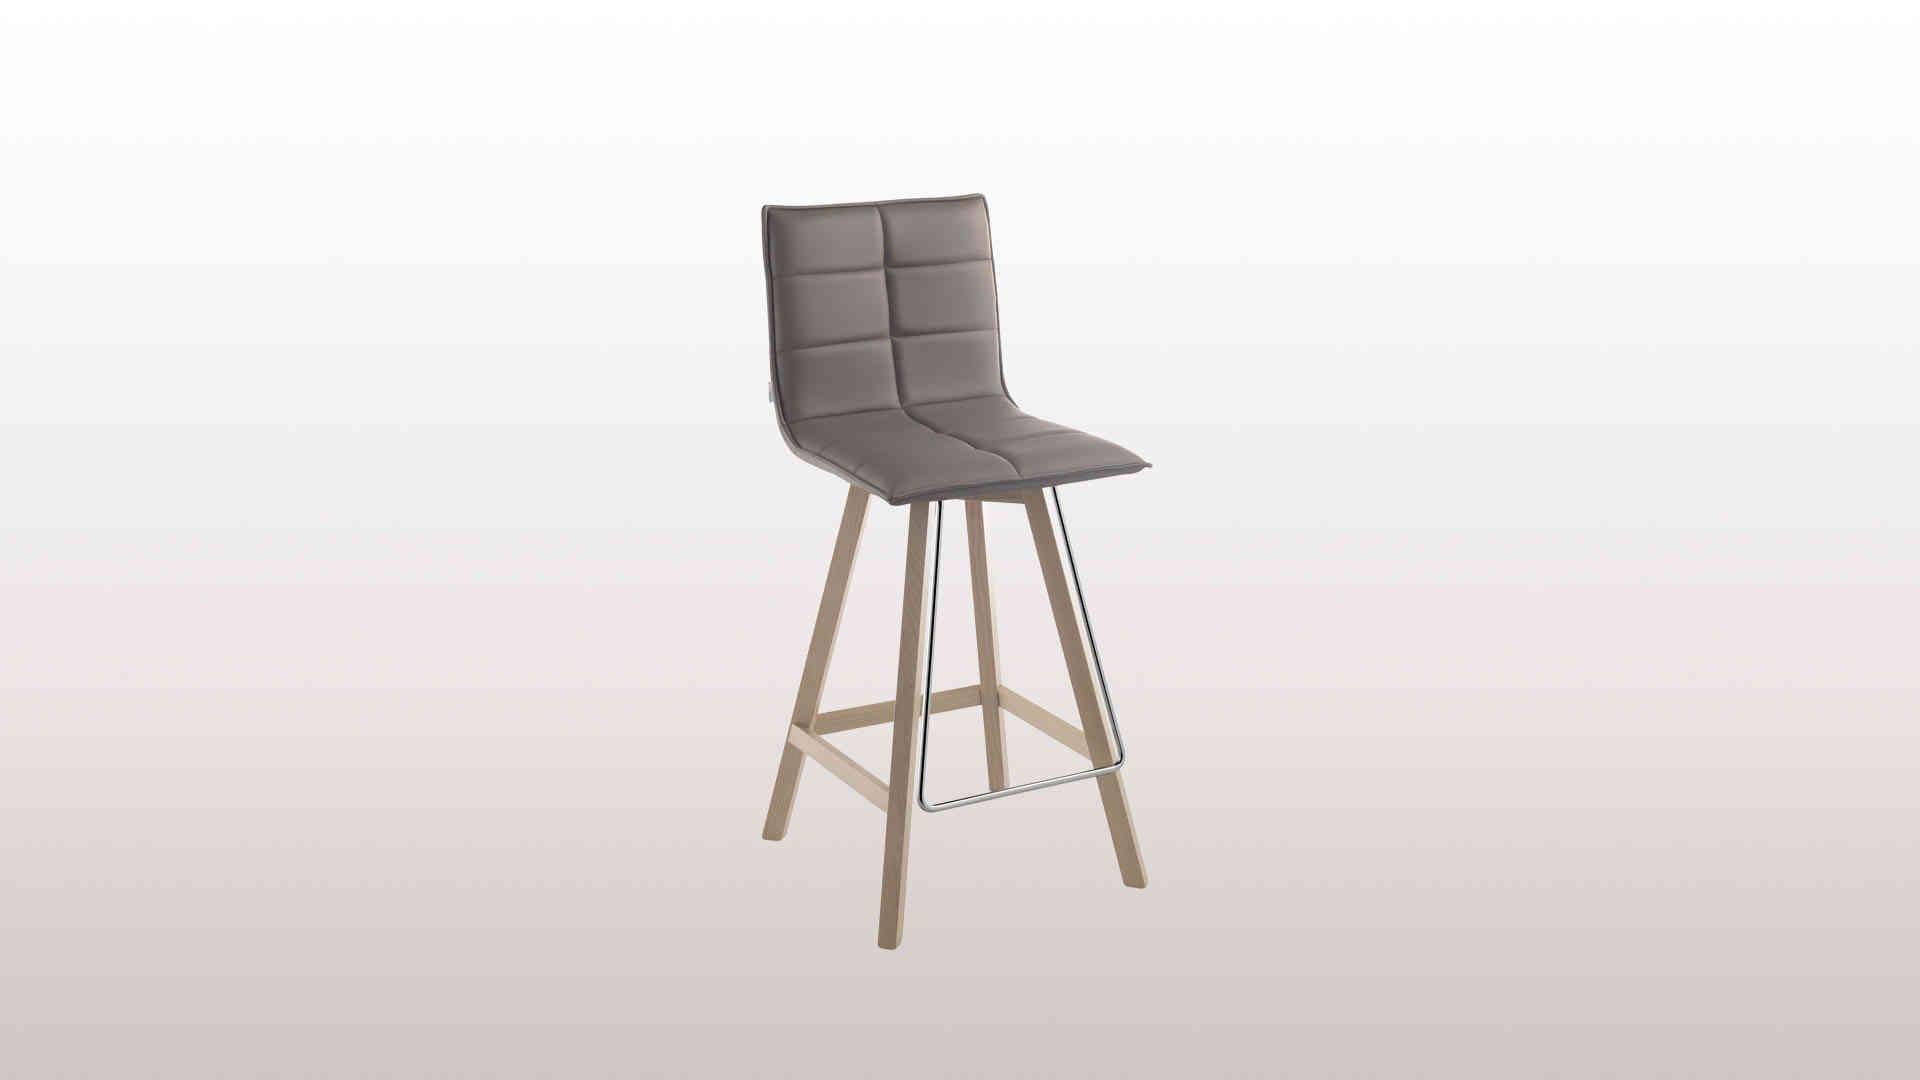 Tabouret de cuisine cuisinella mobilier design for Tabouret de cuisine design